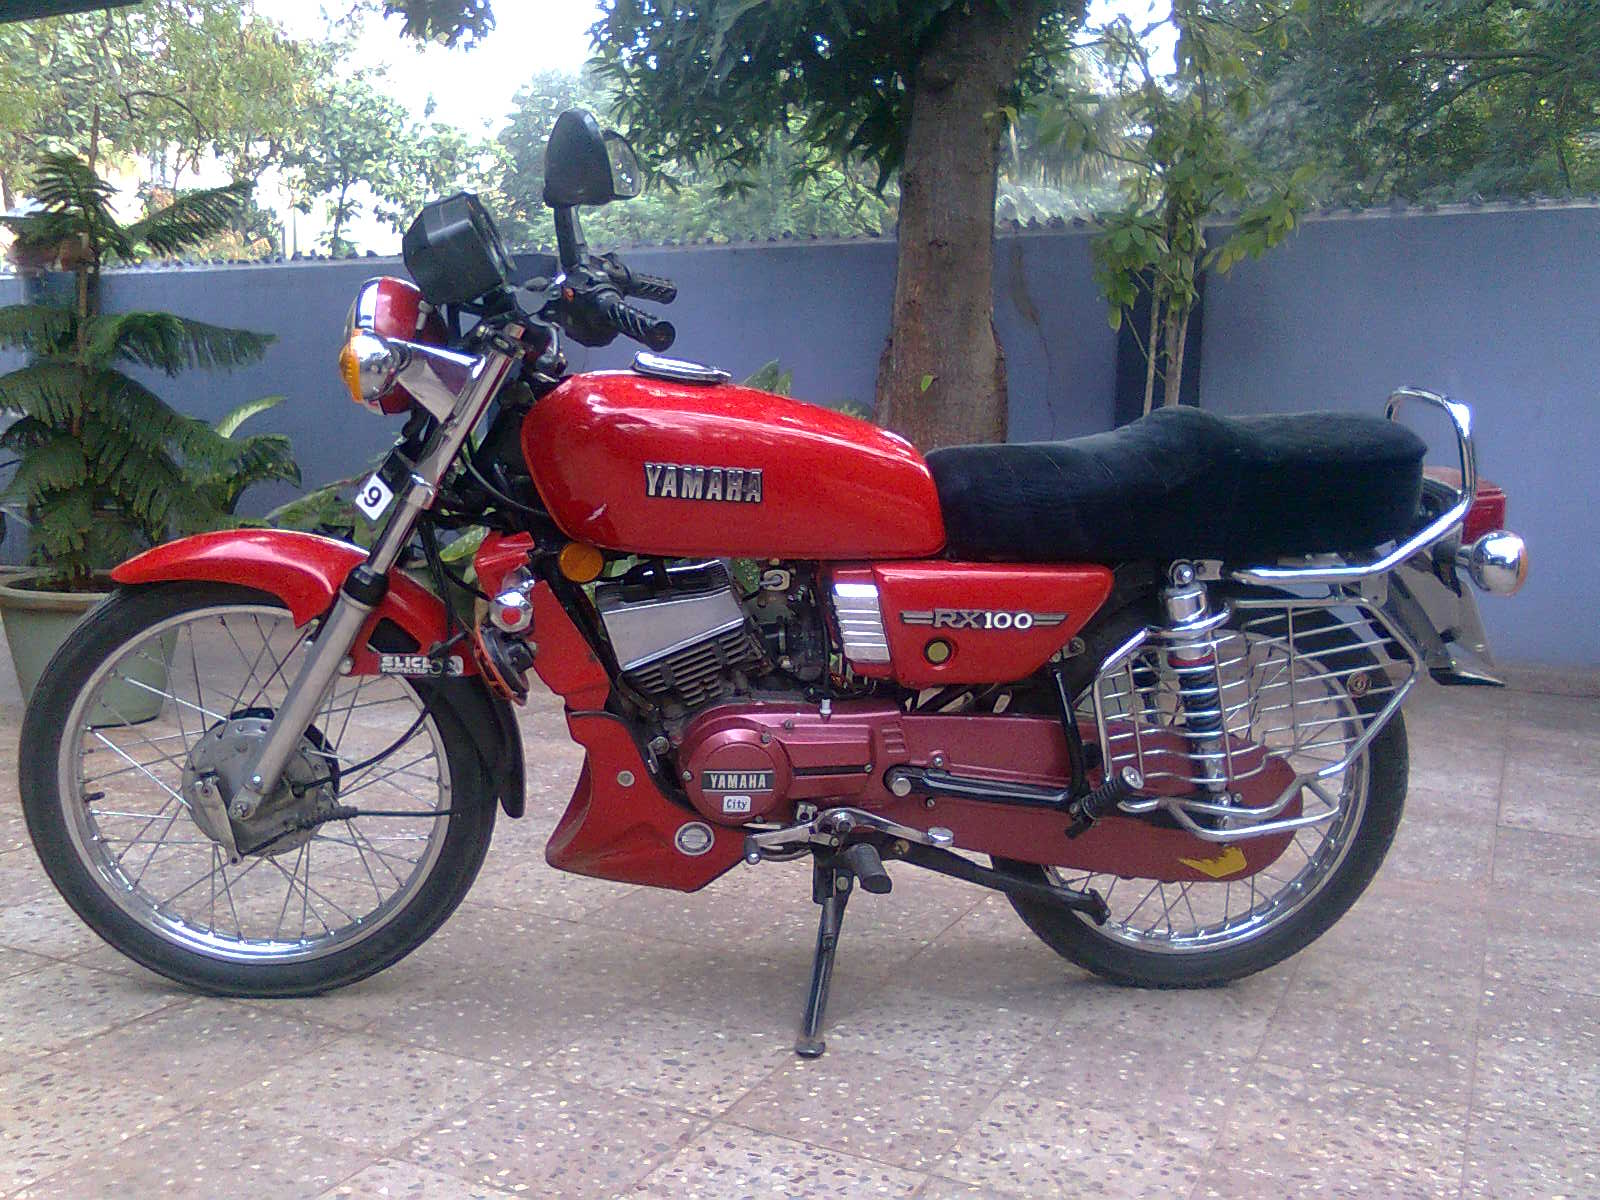 R X 100 Yamaha Loved By All Bikers! - YAMAHA RX100 ...